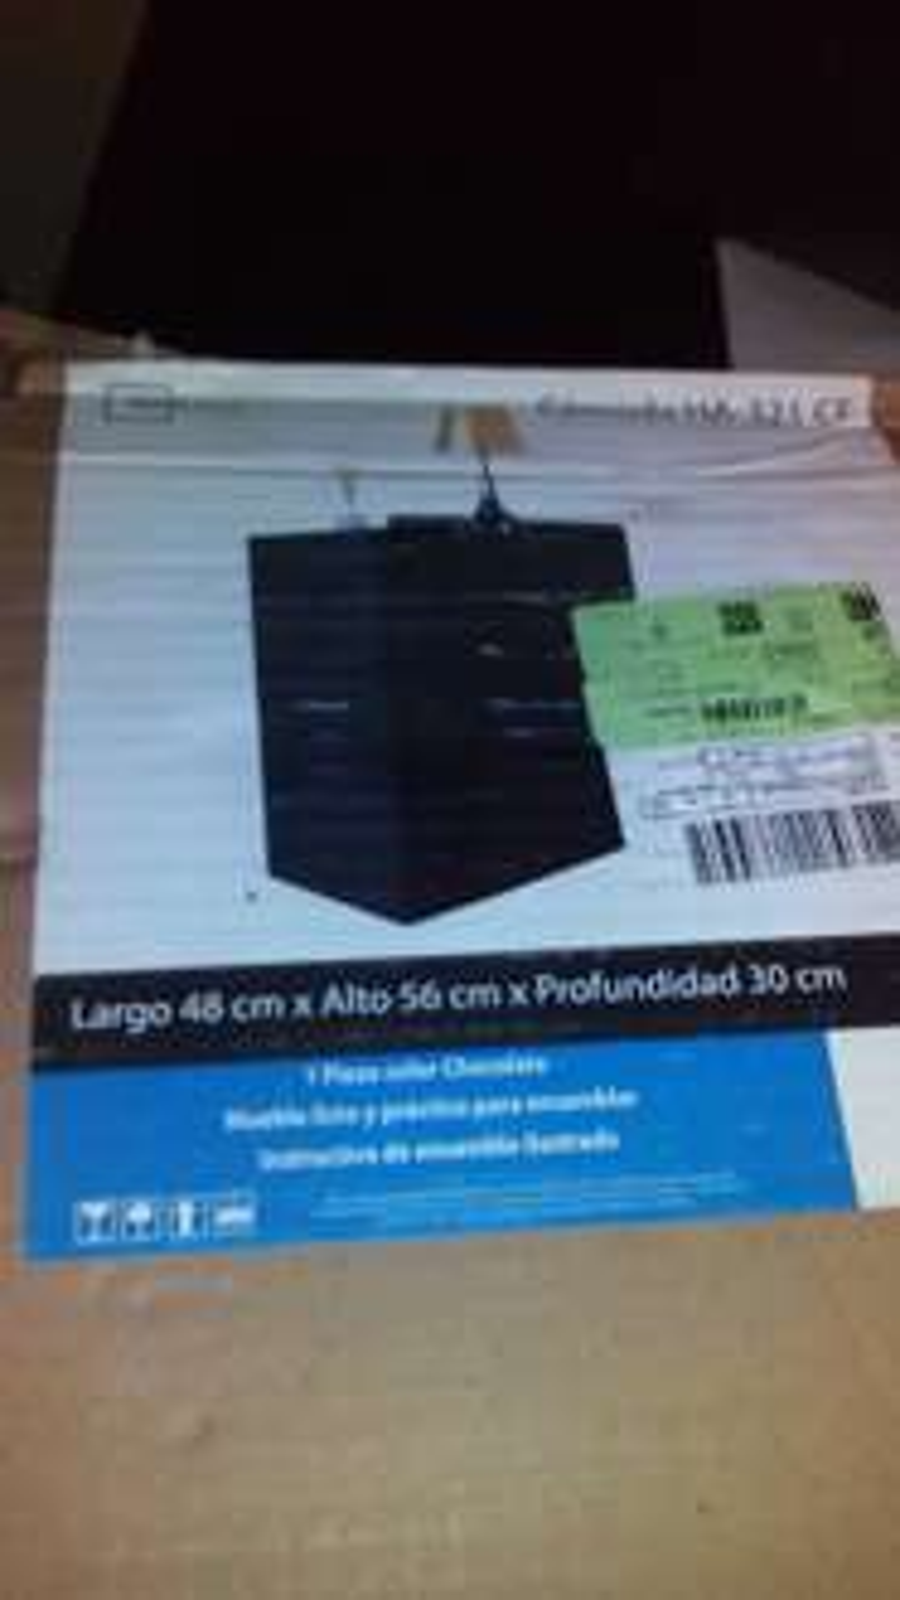 Walmart Quiroga: cómoda Mainstays a $175.02